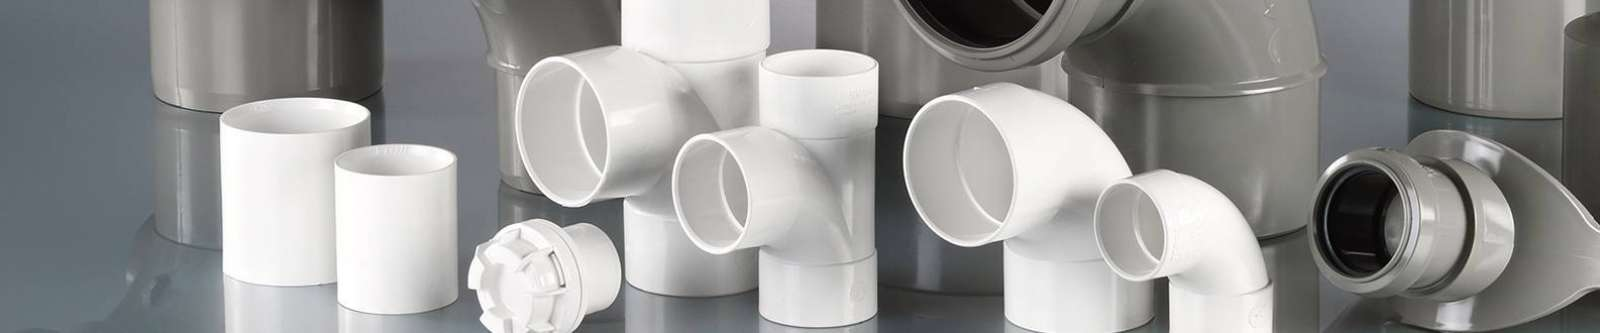 Terrain ABS Solvent Weld Waste